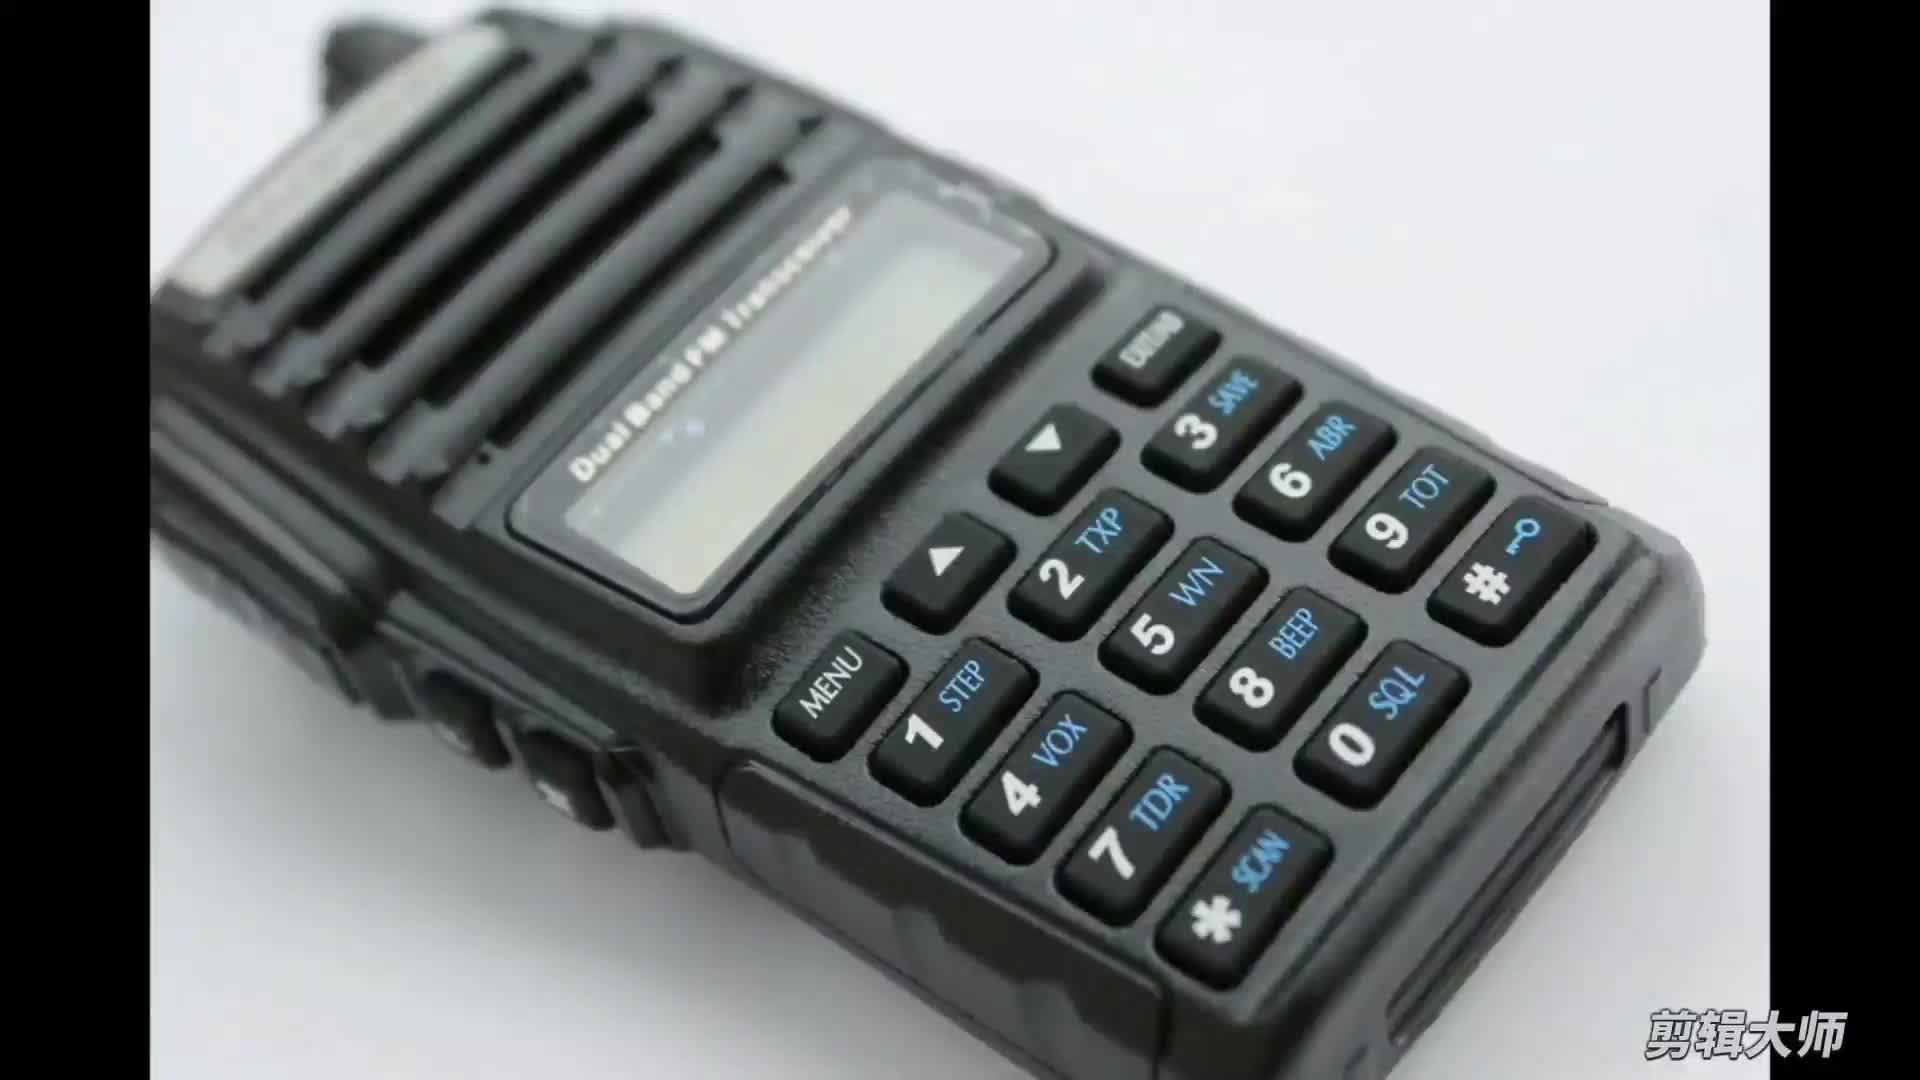 USA ขายร้อนยาว Baofeng UV-82 UHF VHF 10 W Walkie Talkie, baofeng uv82 ผู้ผลิตจีนที่ดีที่สุด